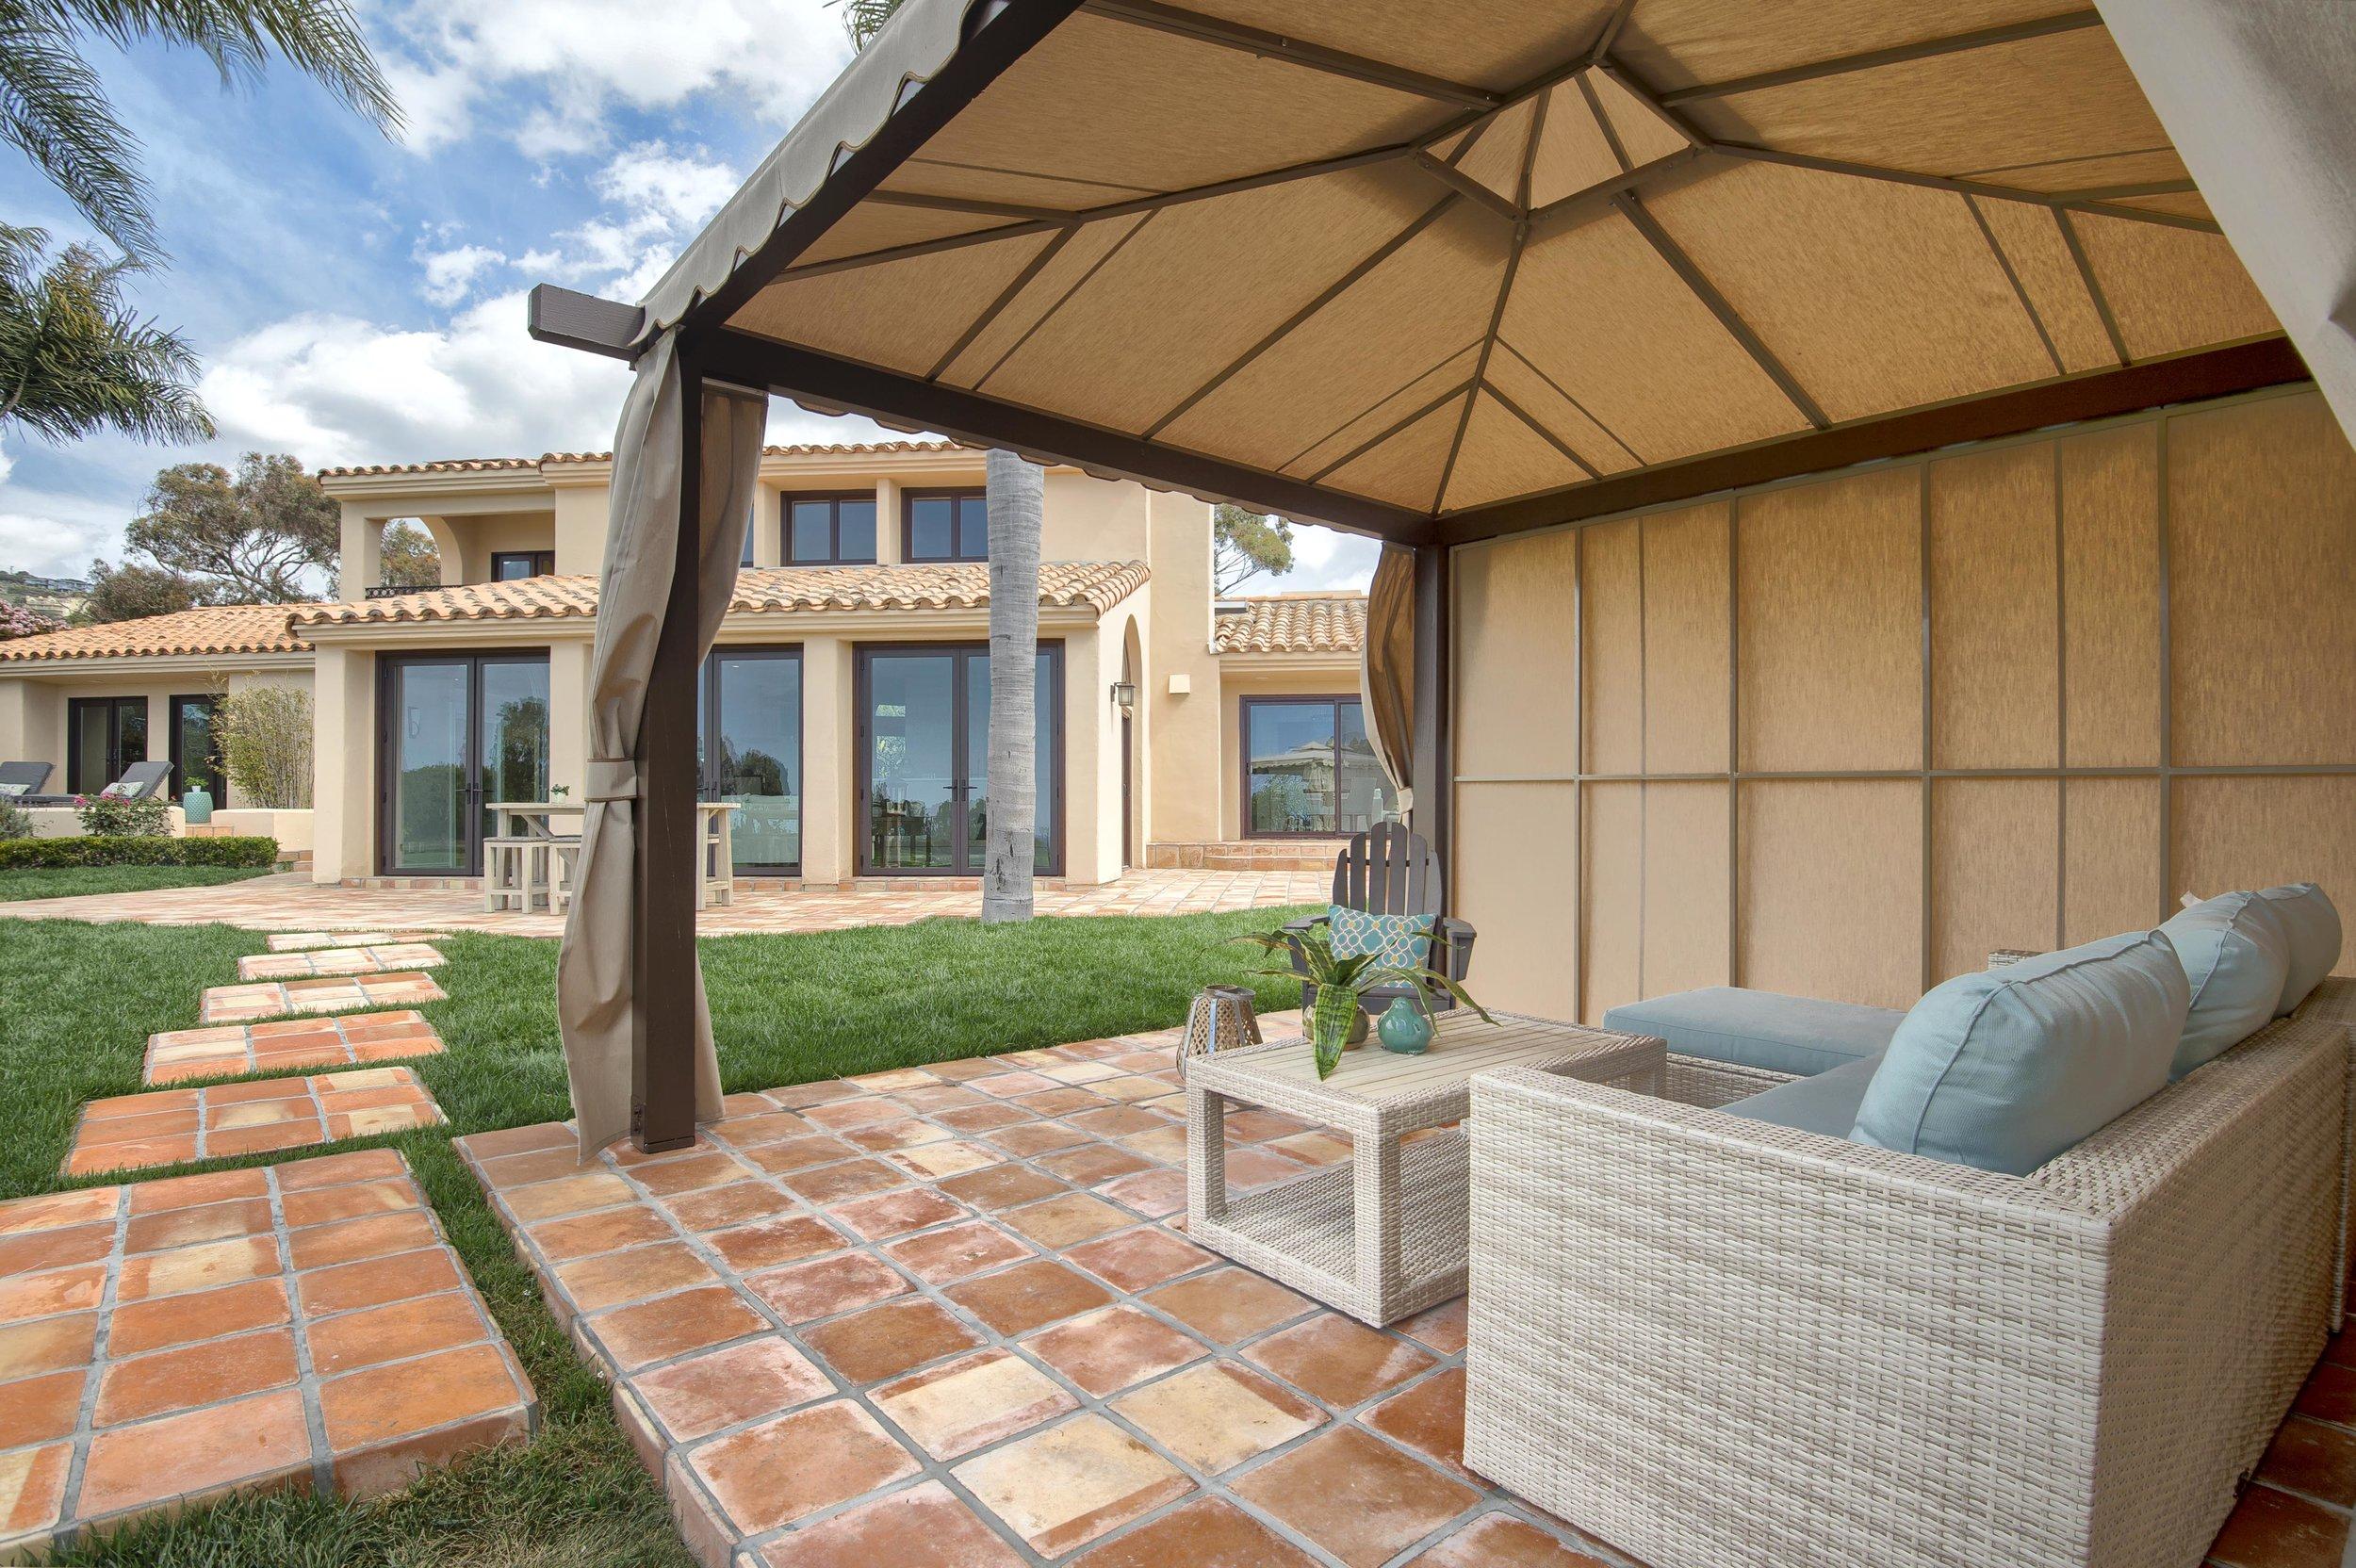 017 Yard 6130 Via Cabrillo For Sale Lease The Malibu Life Team Luxury Real Estate.jpg